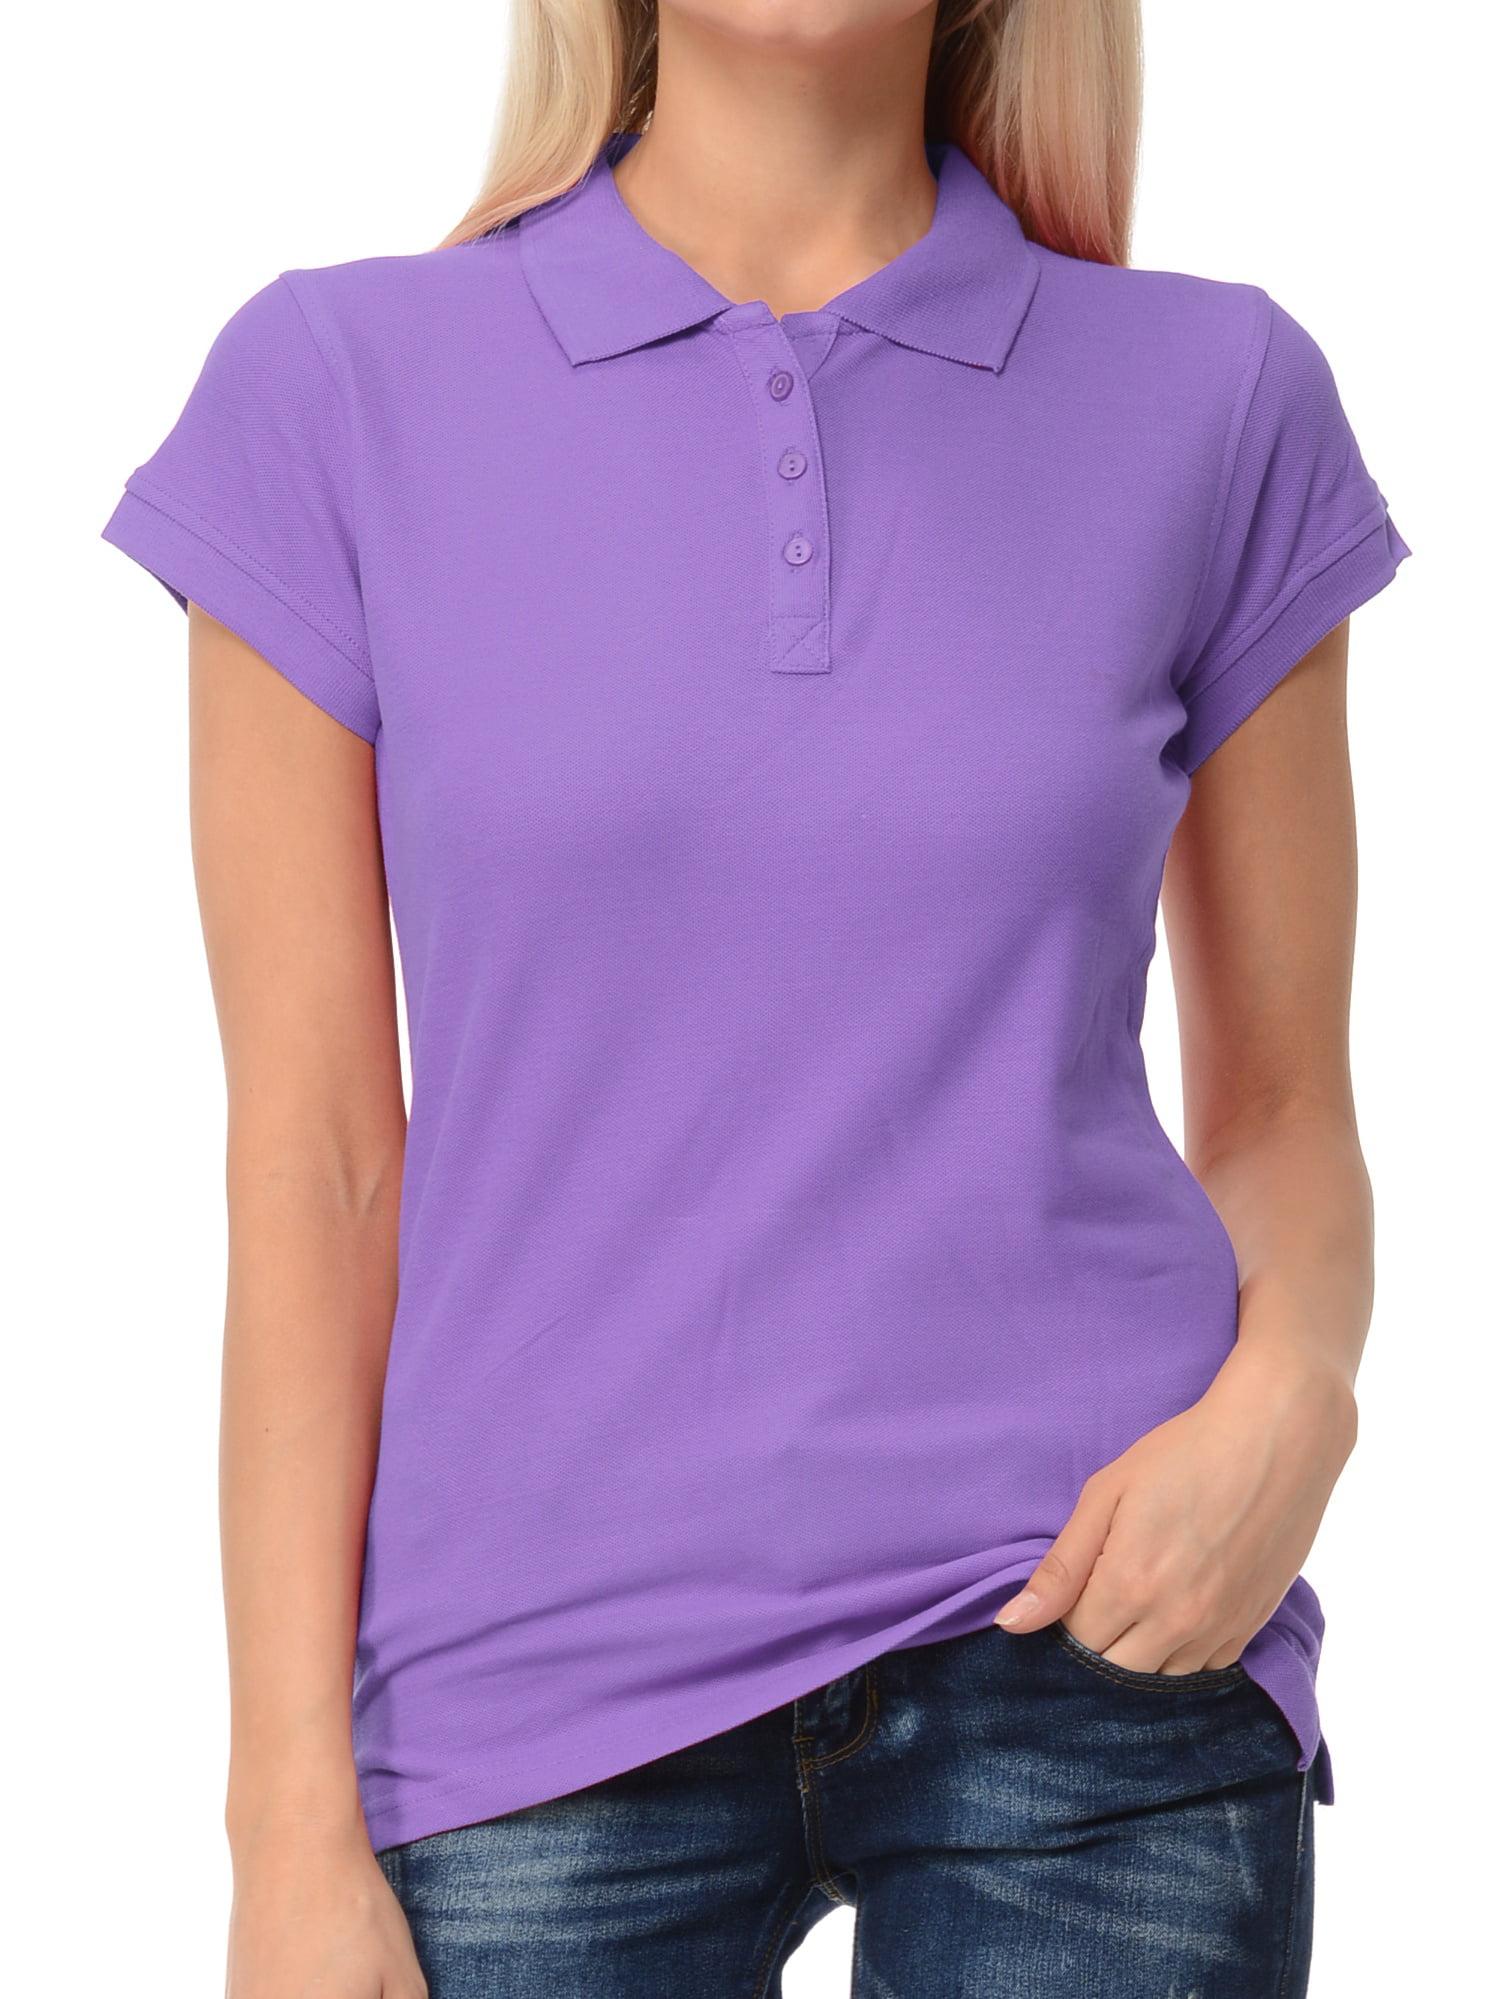 Basico Women Junior's Short Sleeve Slim Fit  Polo Shirt  100% Cotton